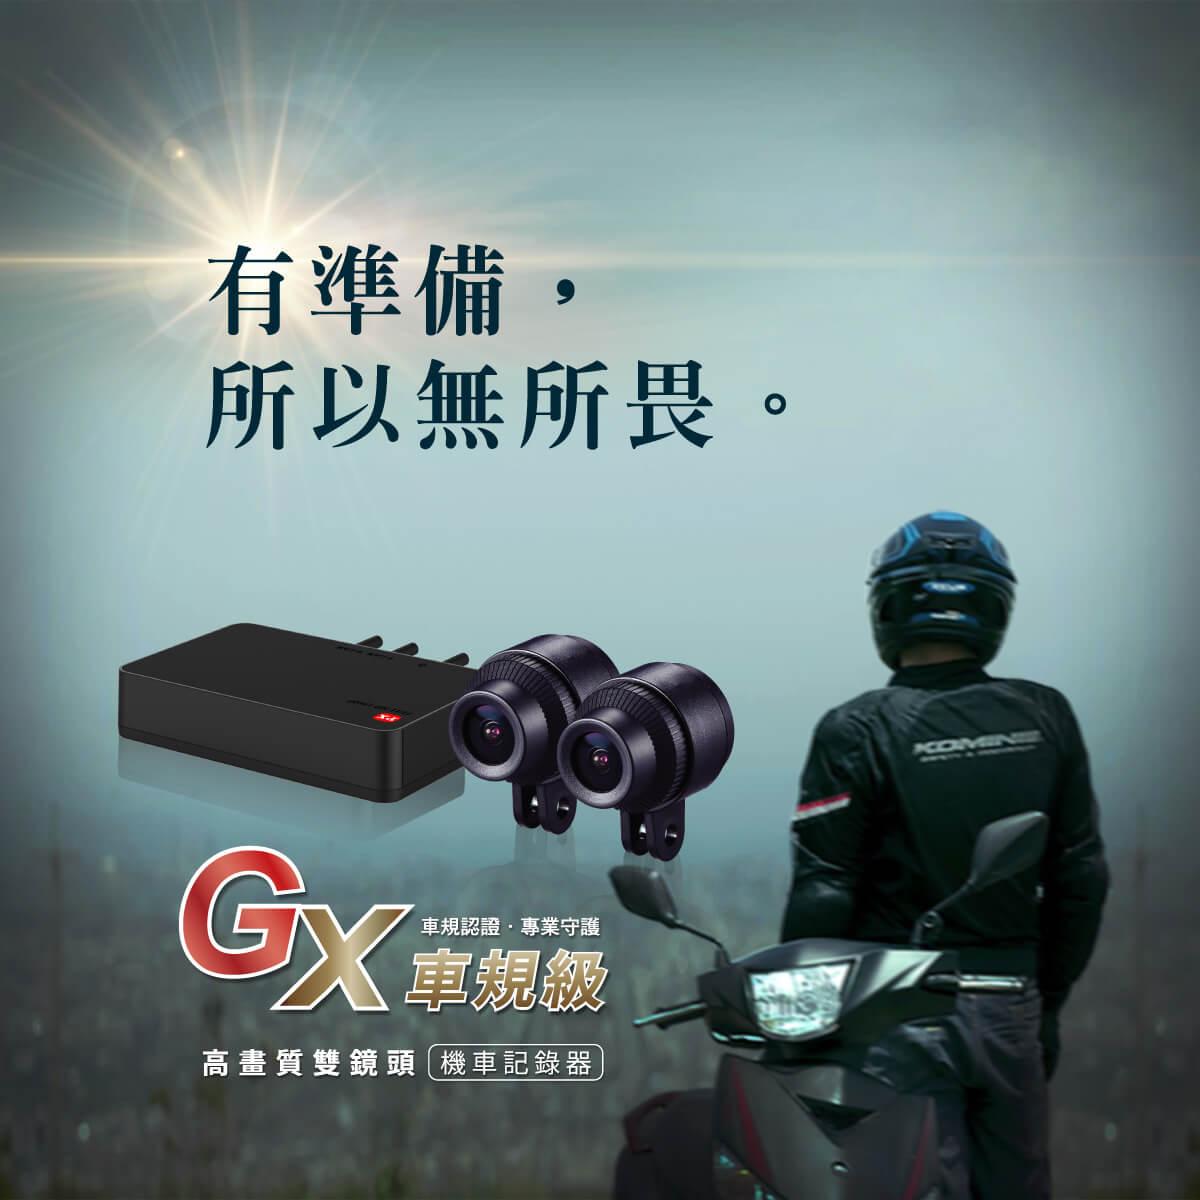 proimages/product/Bike_Cam/PX-GX-V2/01.jpg